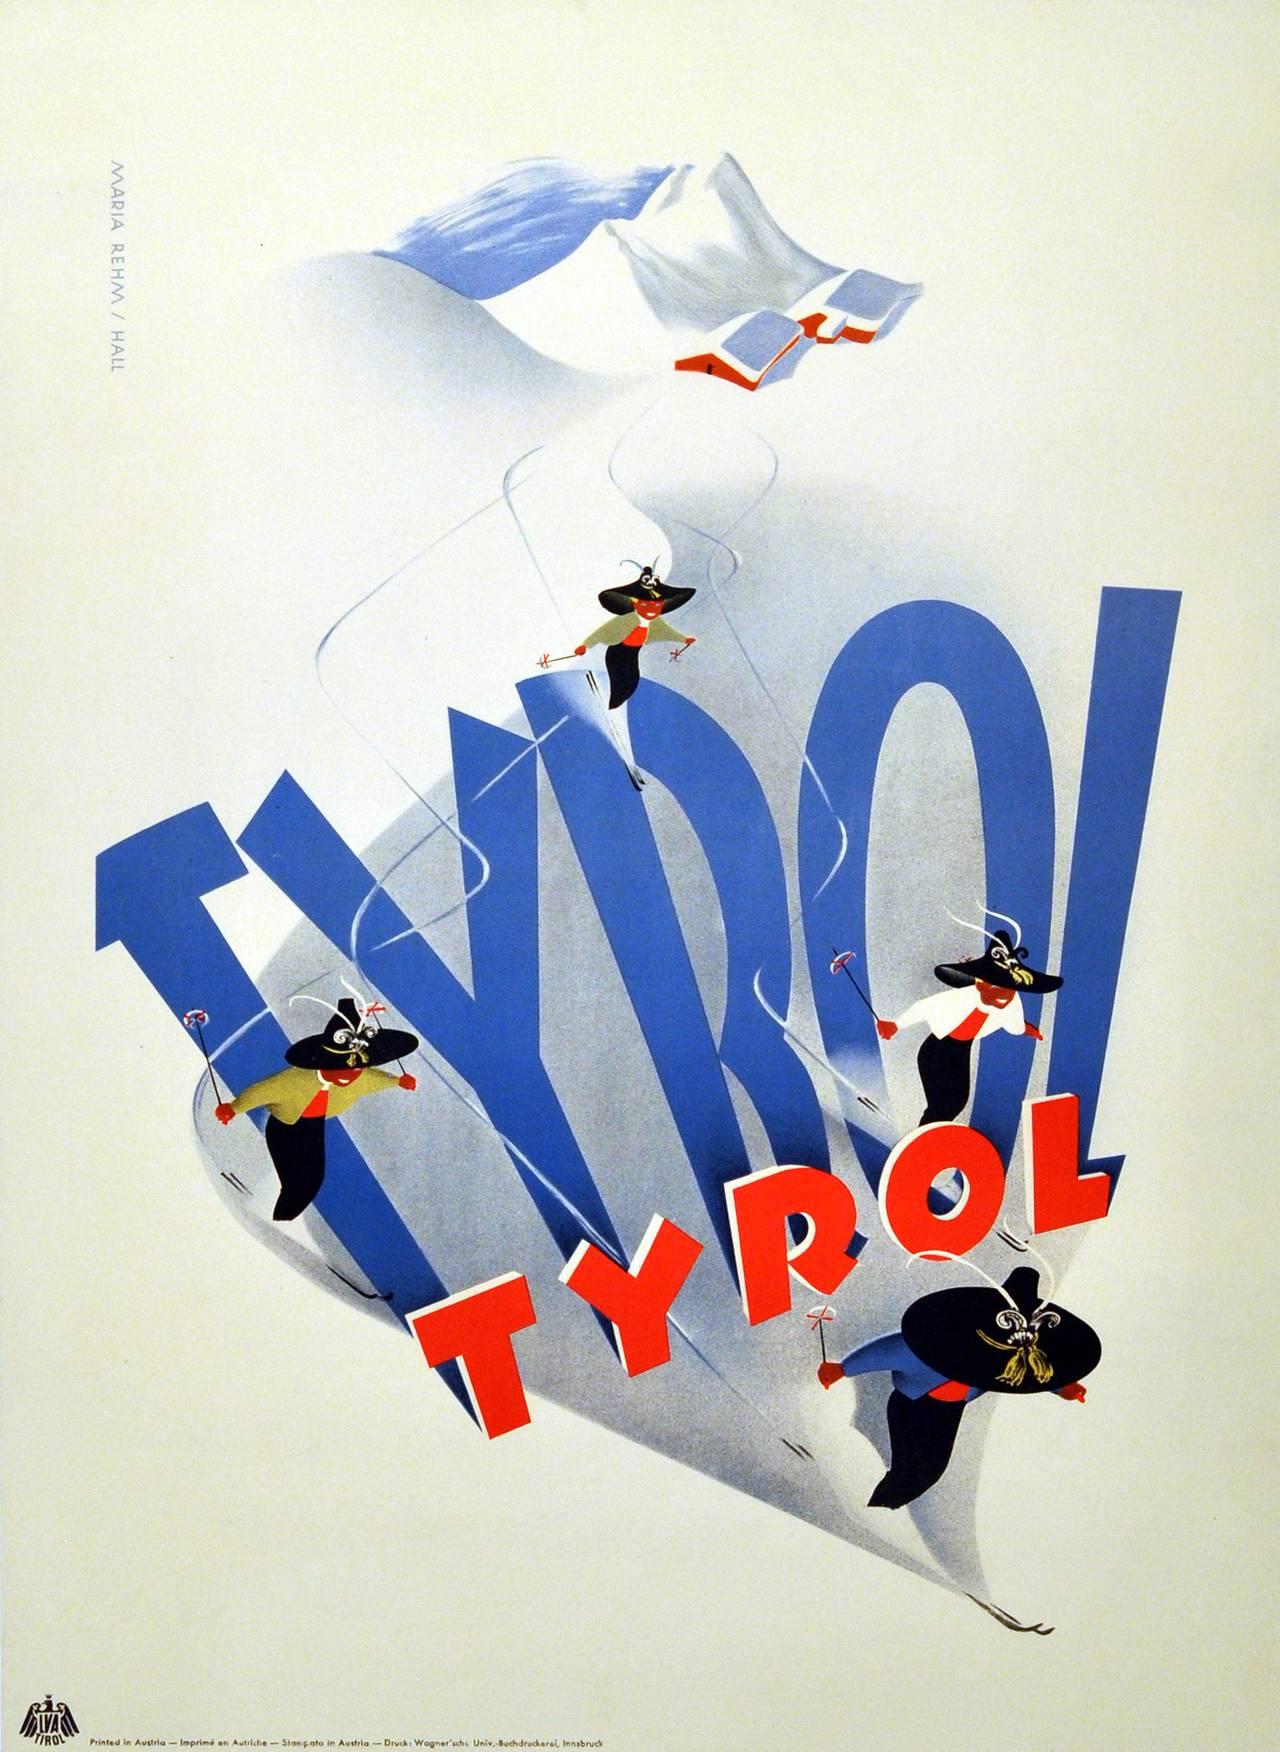 Maria Rehm Hall Original Vintage Skiing Poster For Tyrol